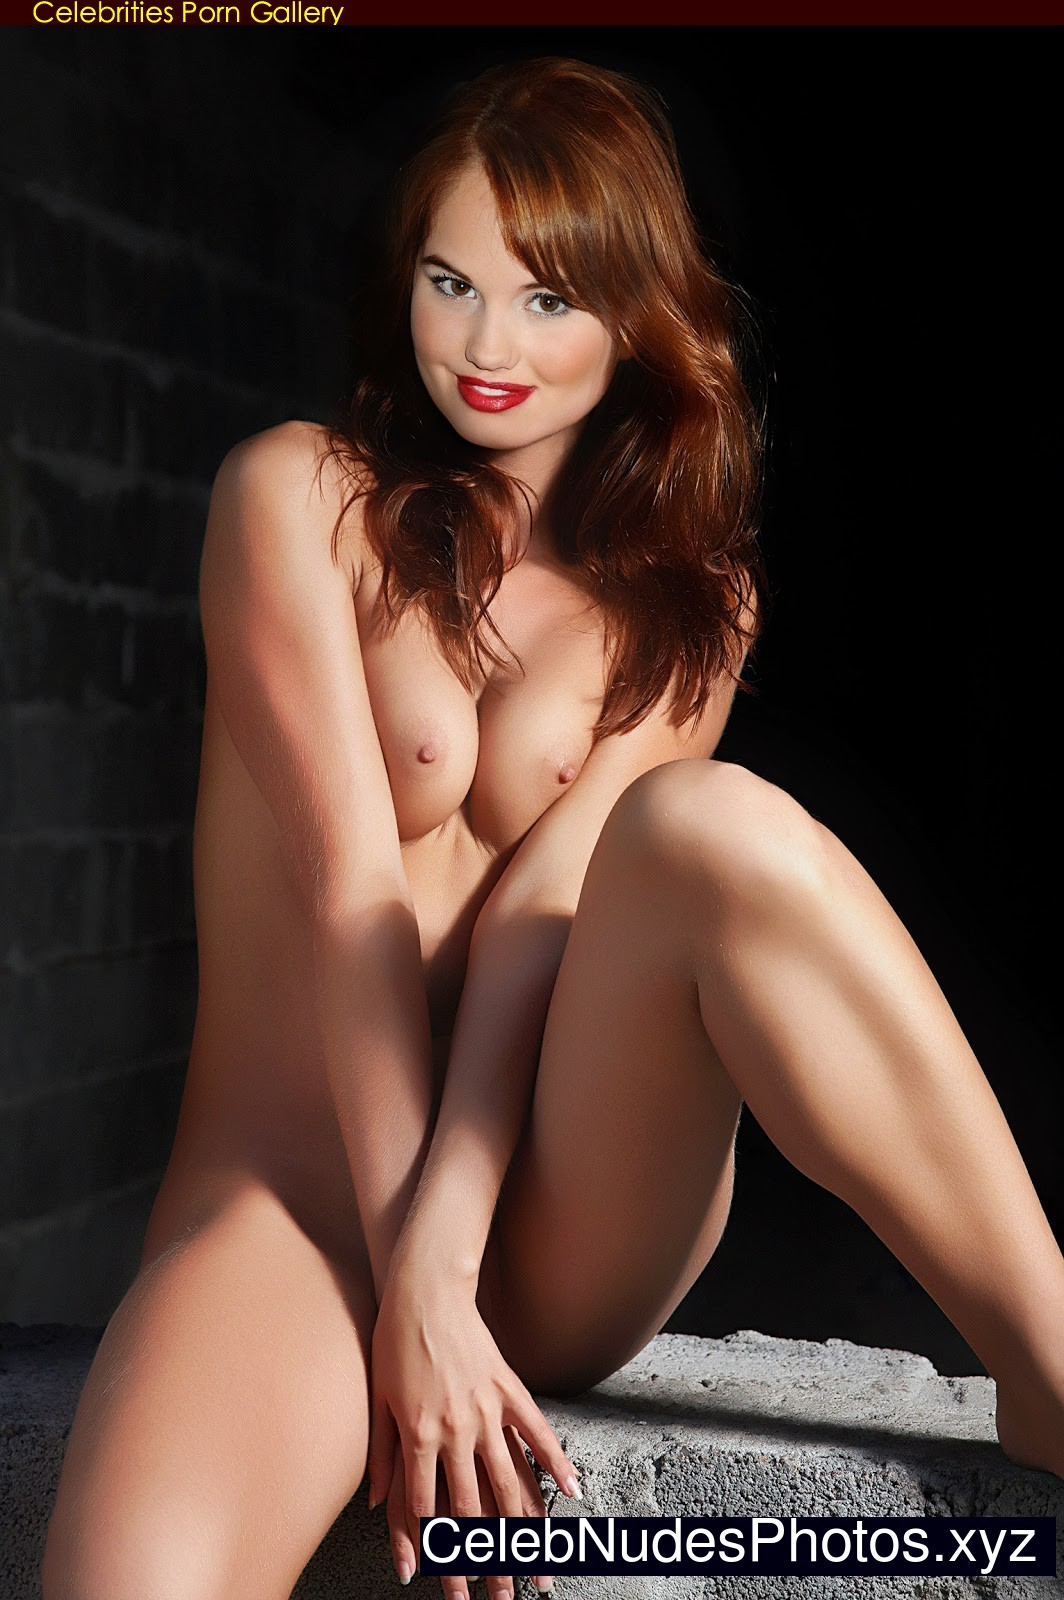 Debby ryan naked photos